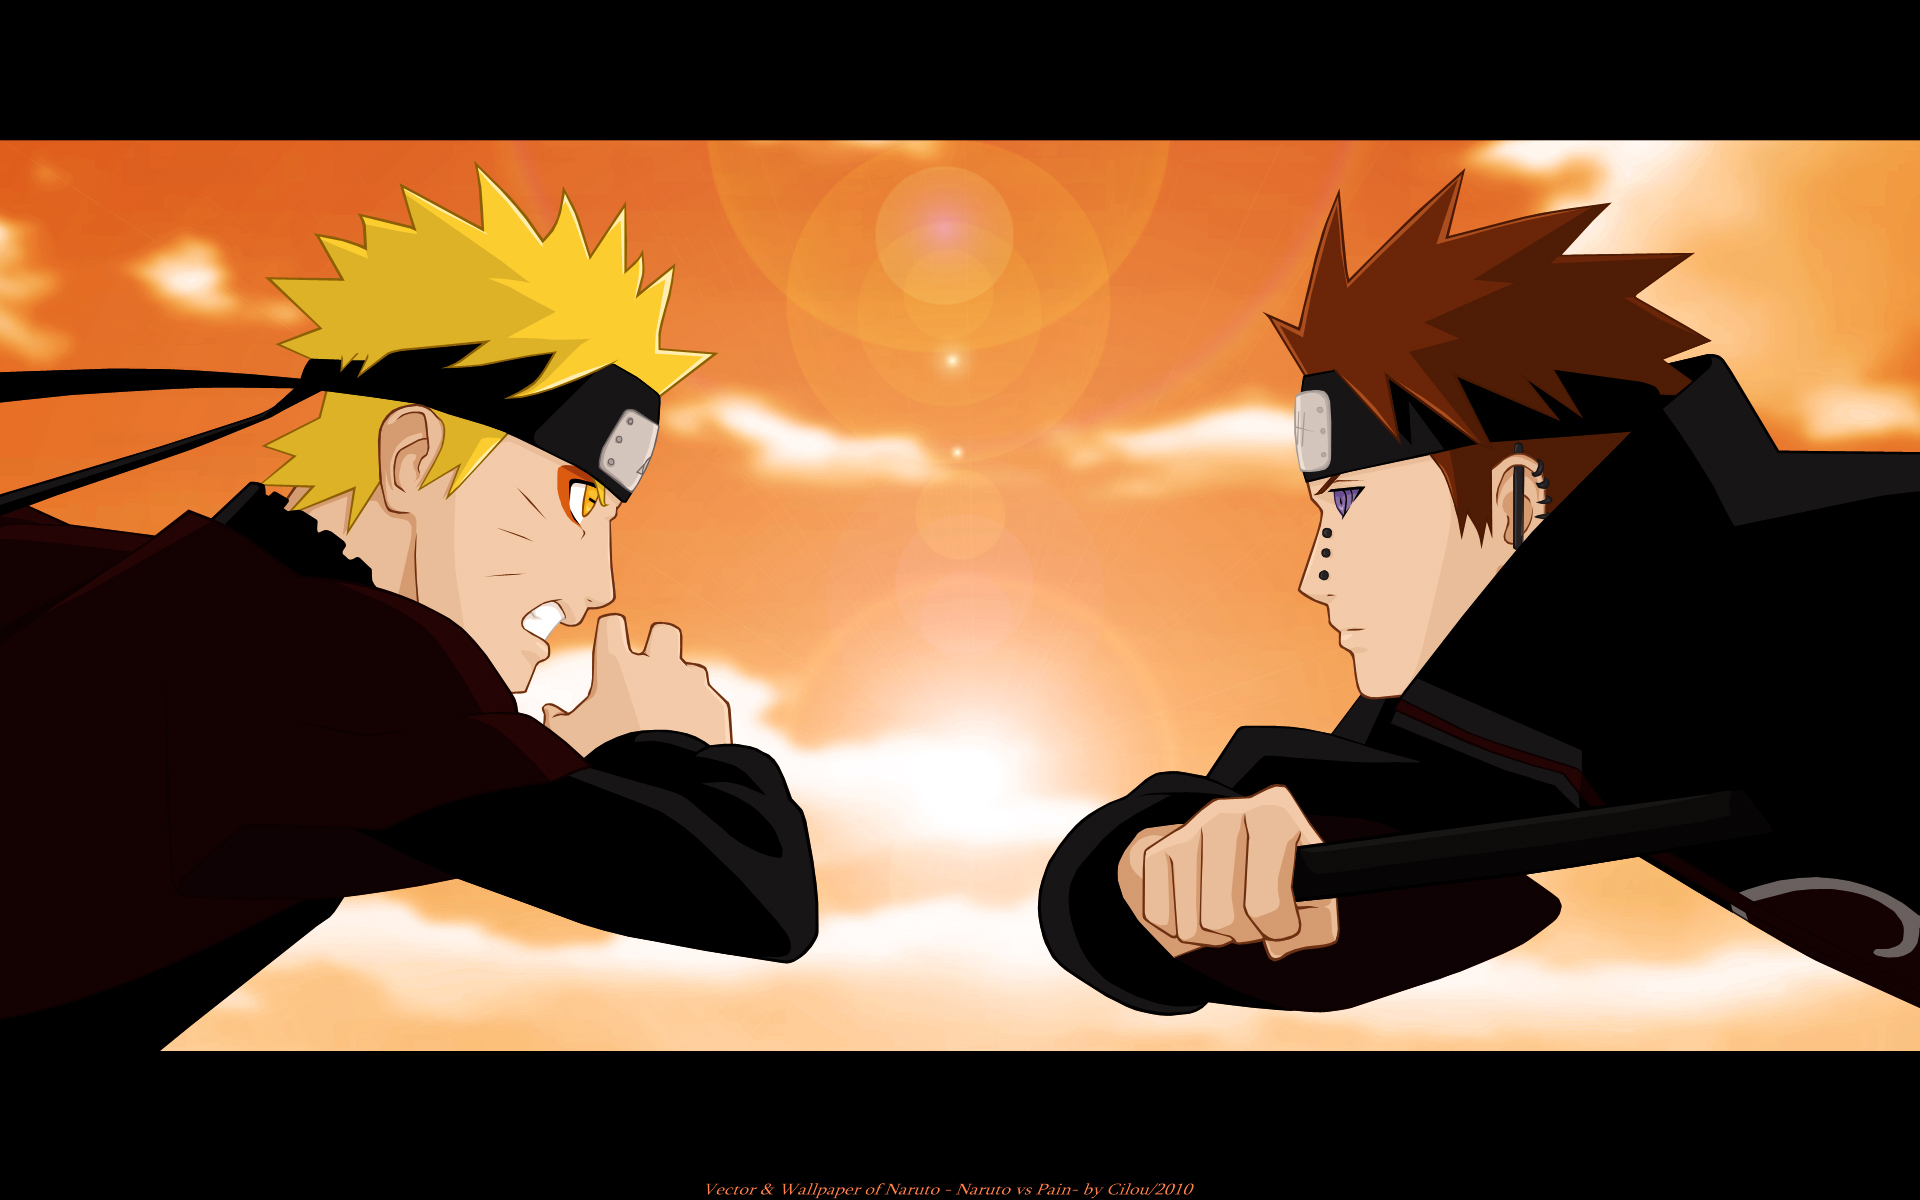 Naruto Hd Wallpaper 1600x900 Наруто против Пейна Наруто Youloveit Ru